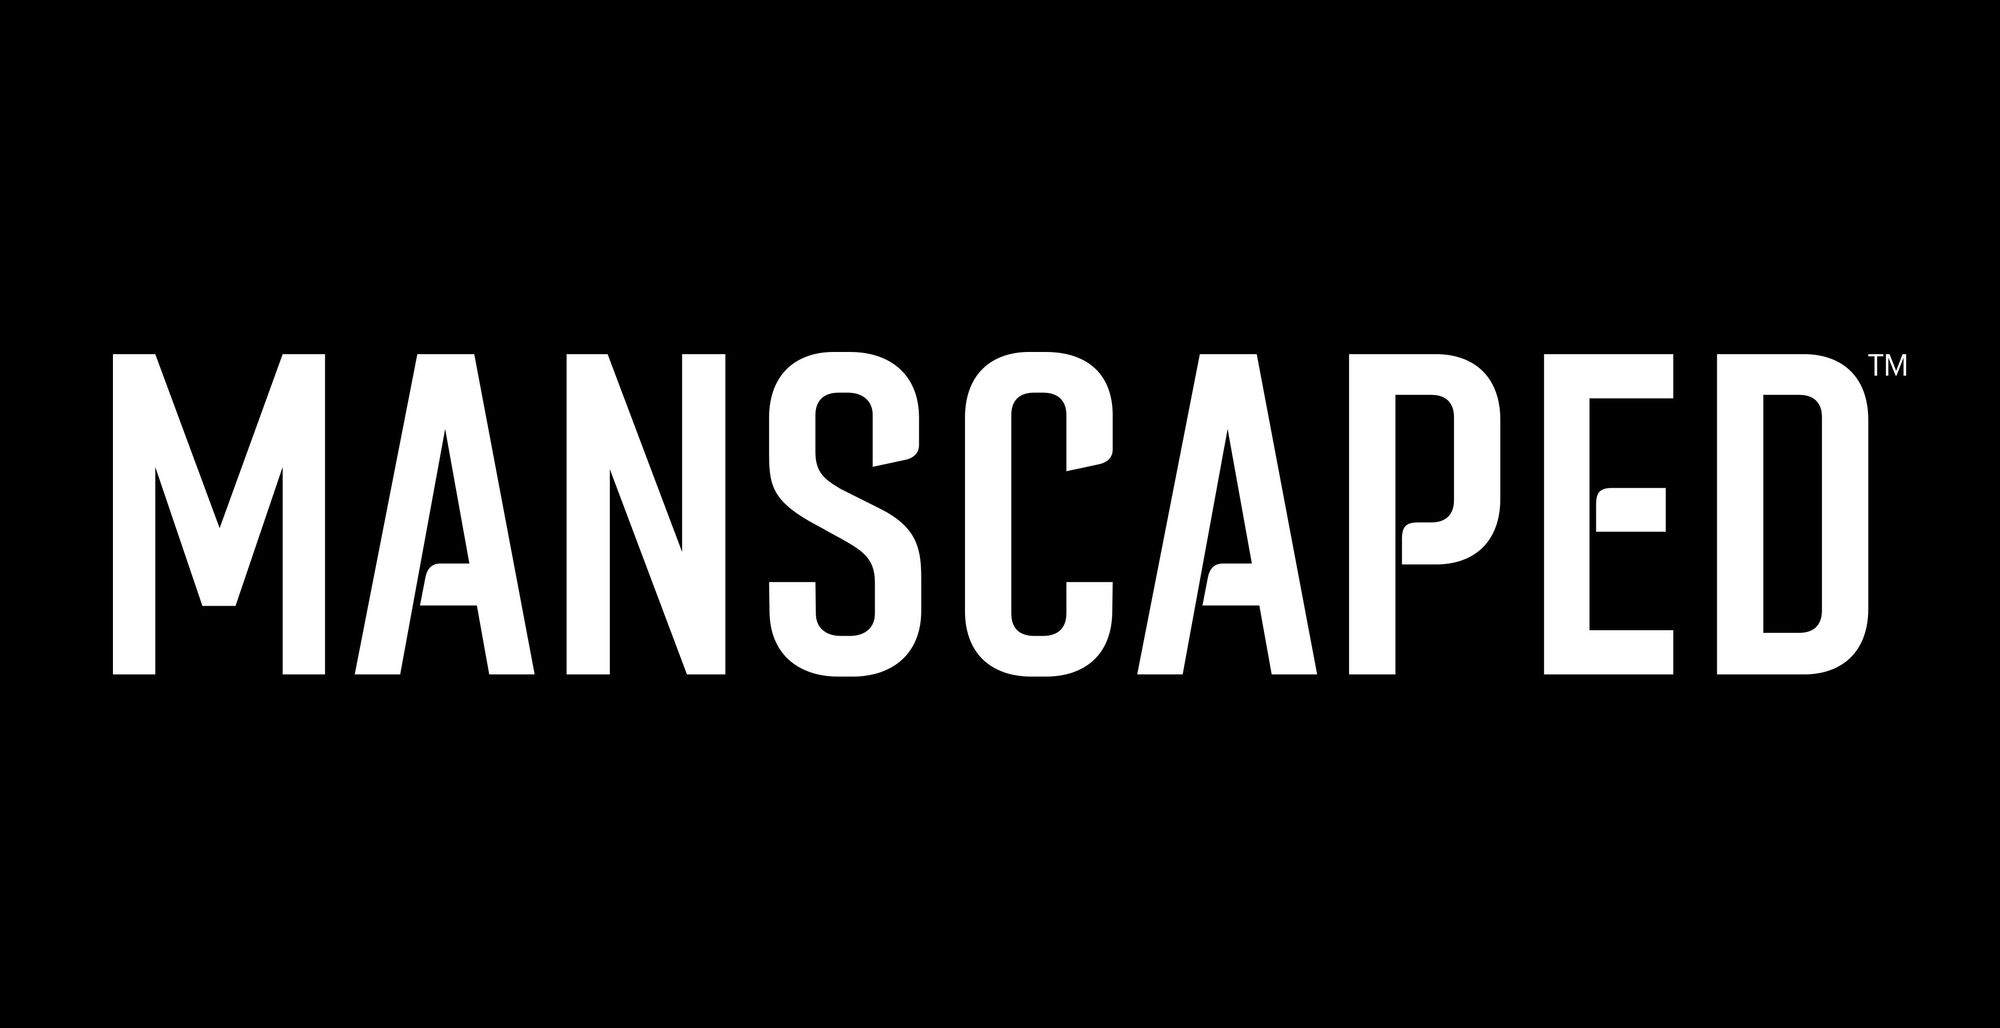 Is The Manscaped™ Crop Mop® Vegan?